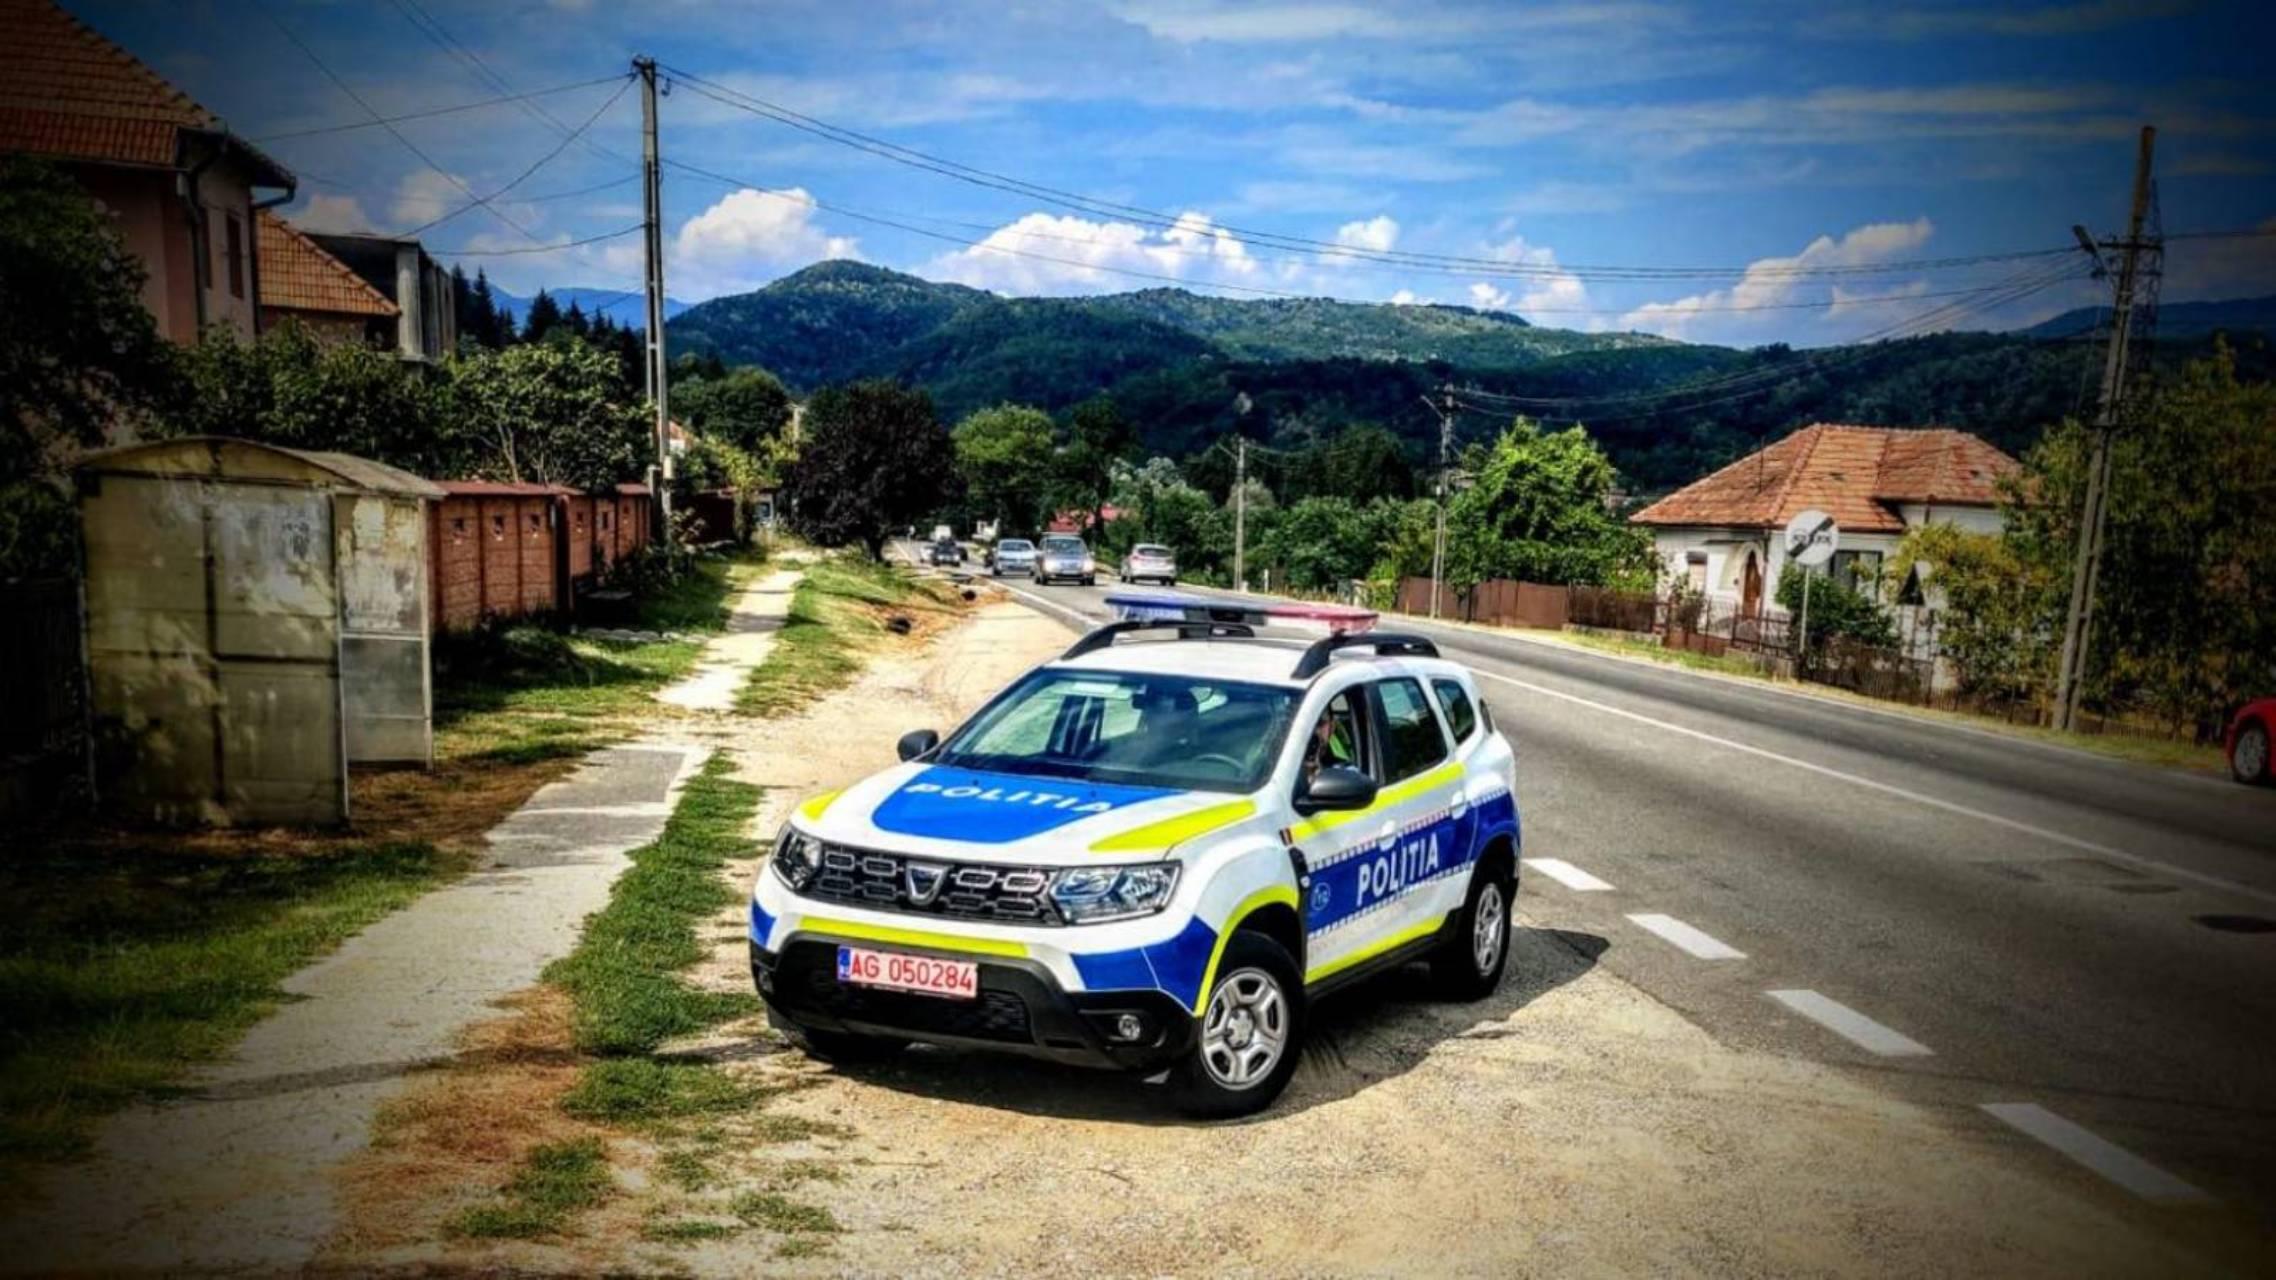 Politia Romana autostrada vreme